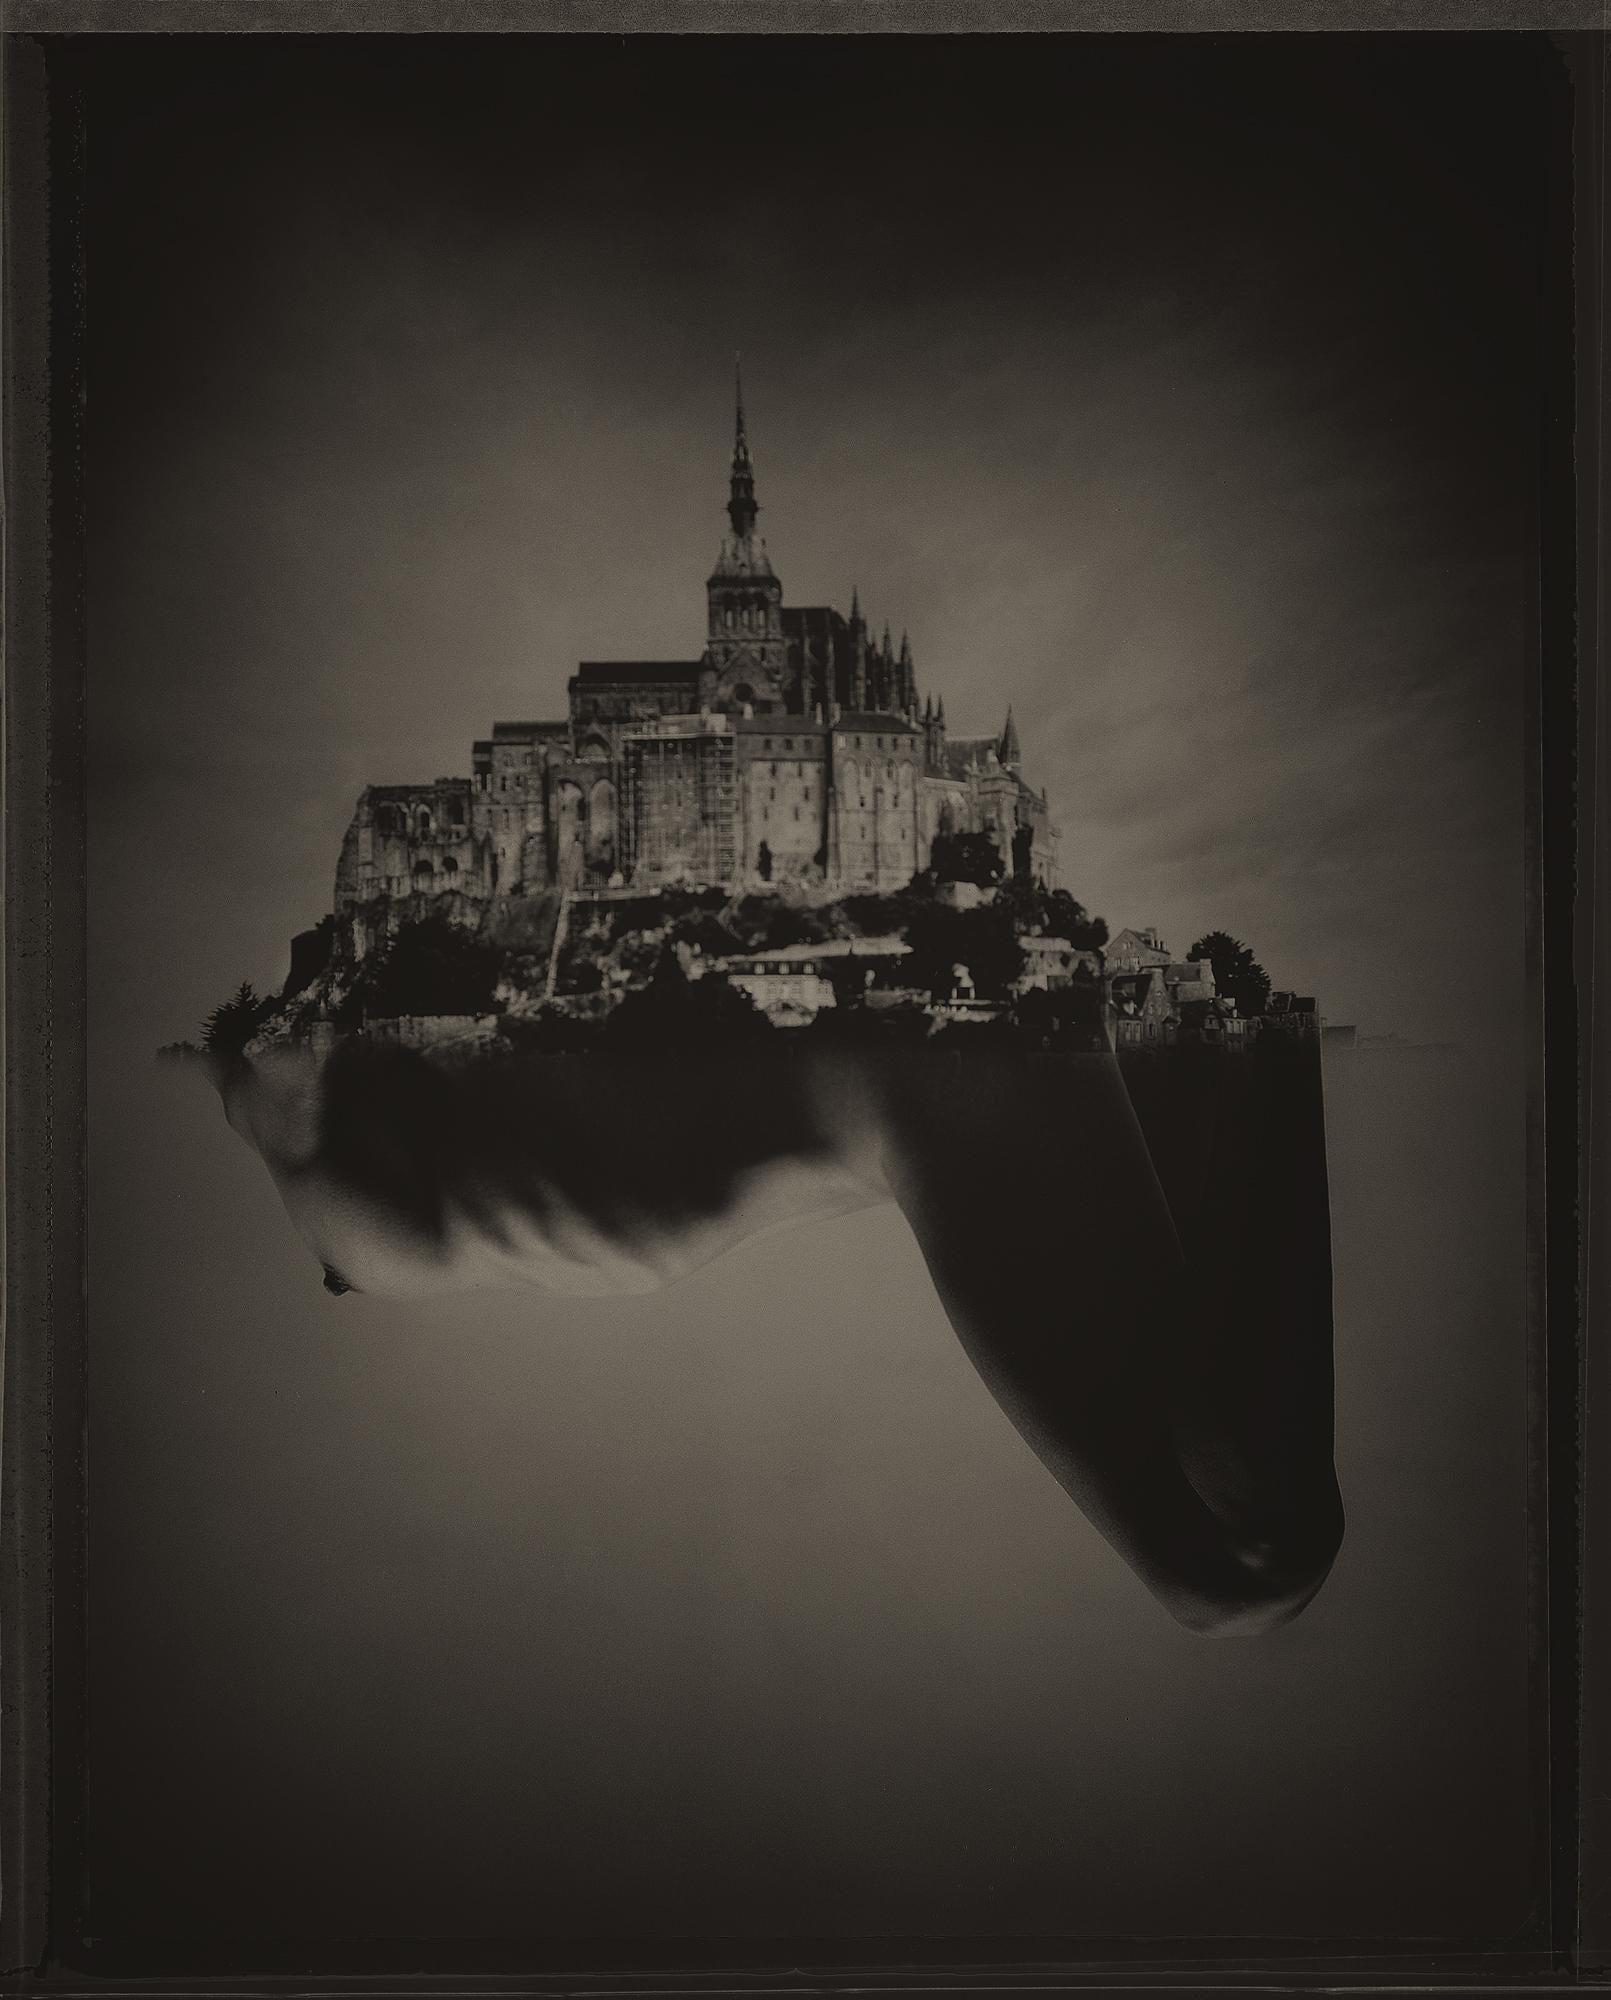 Untitled, Contemporary, 21st Century, Polaroid, Landscape Photography